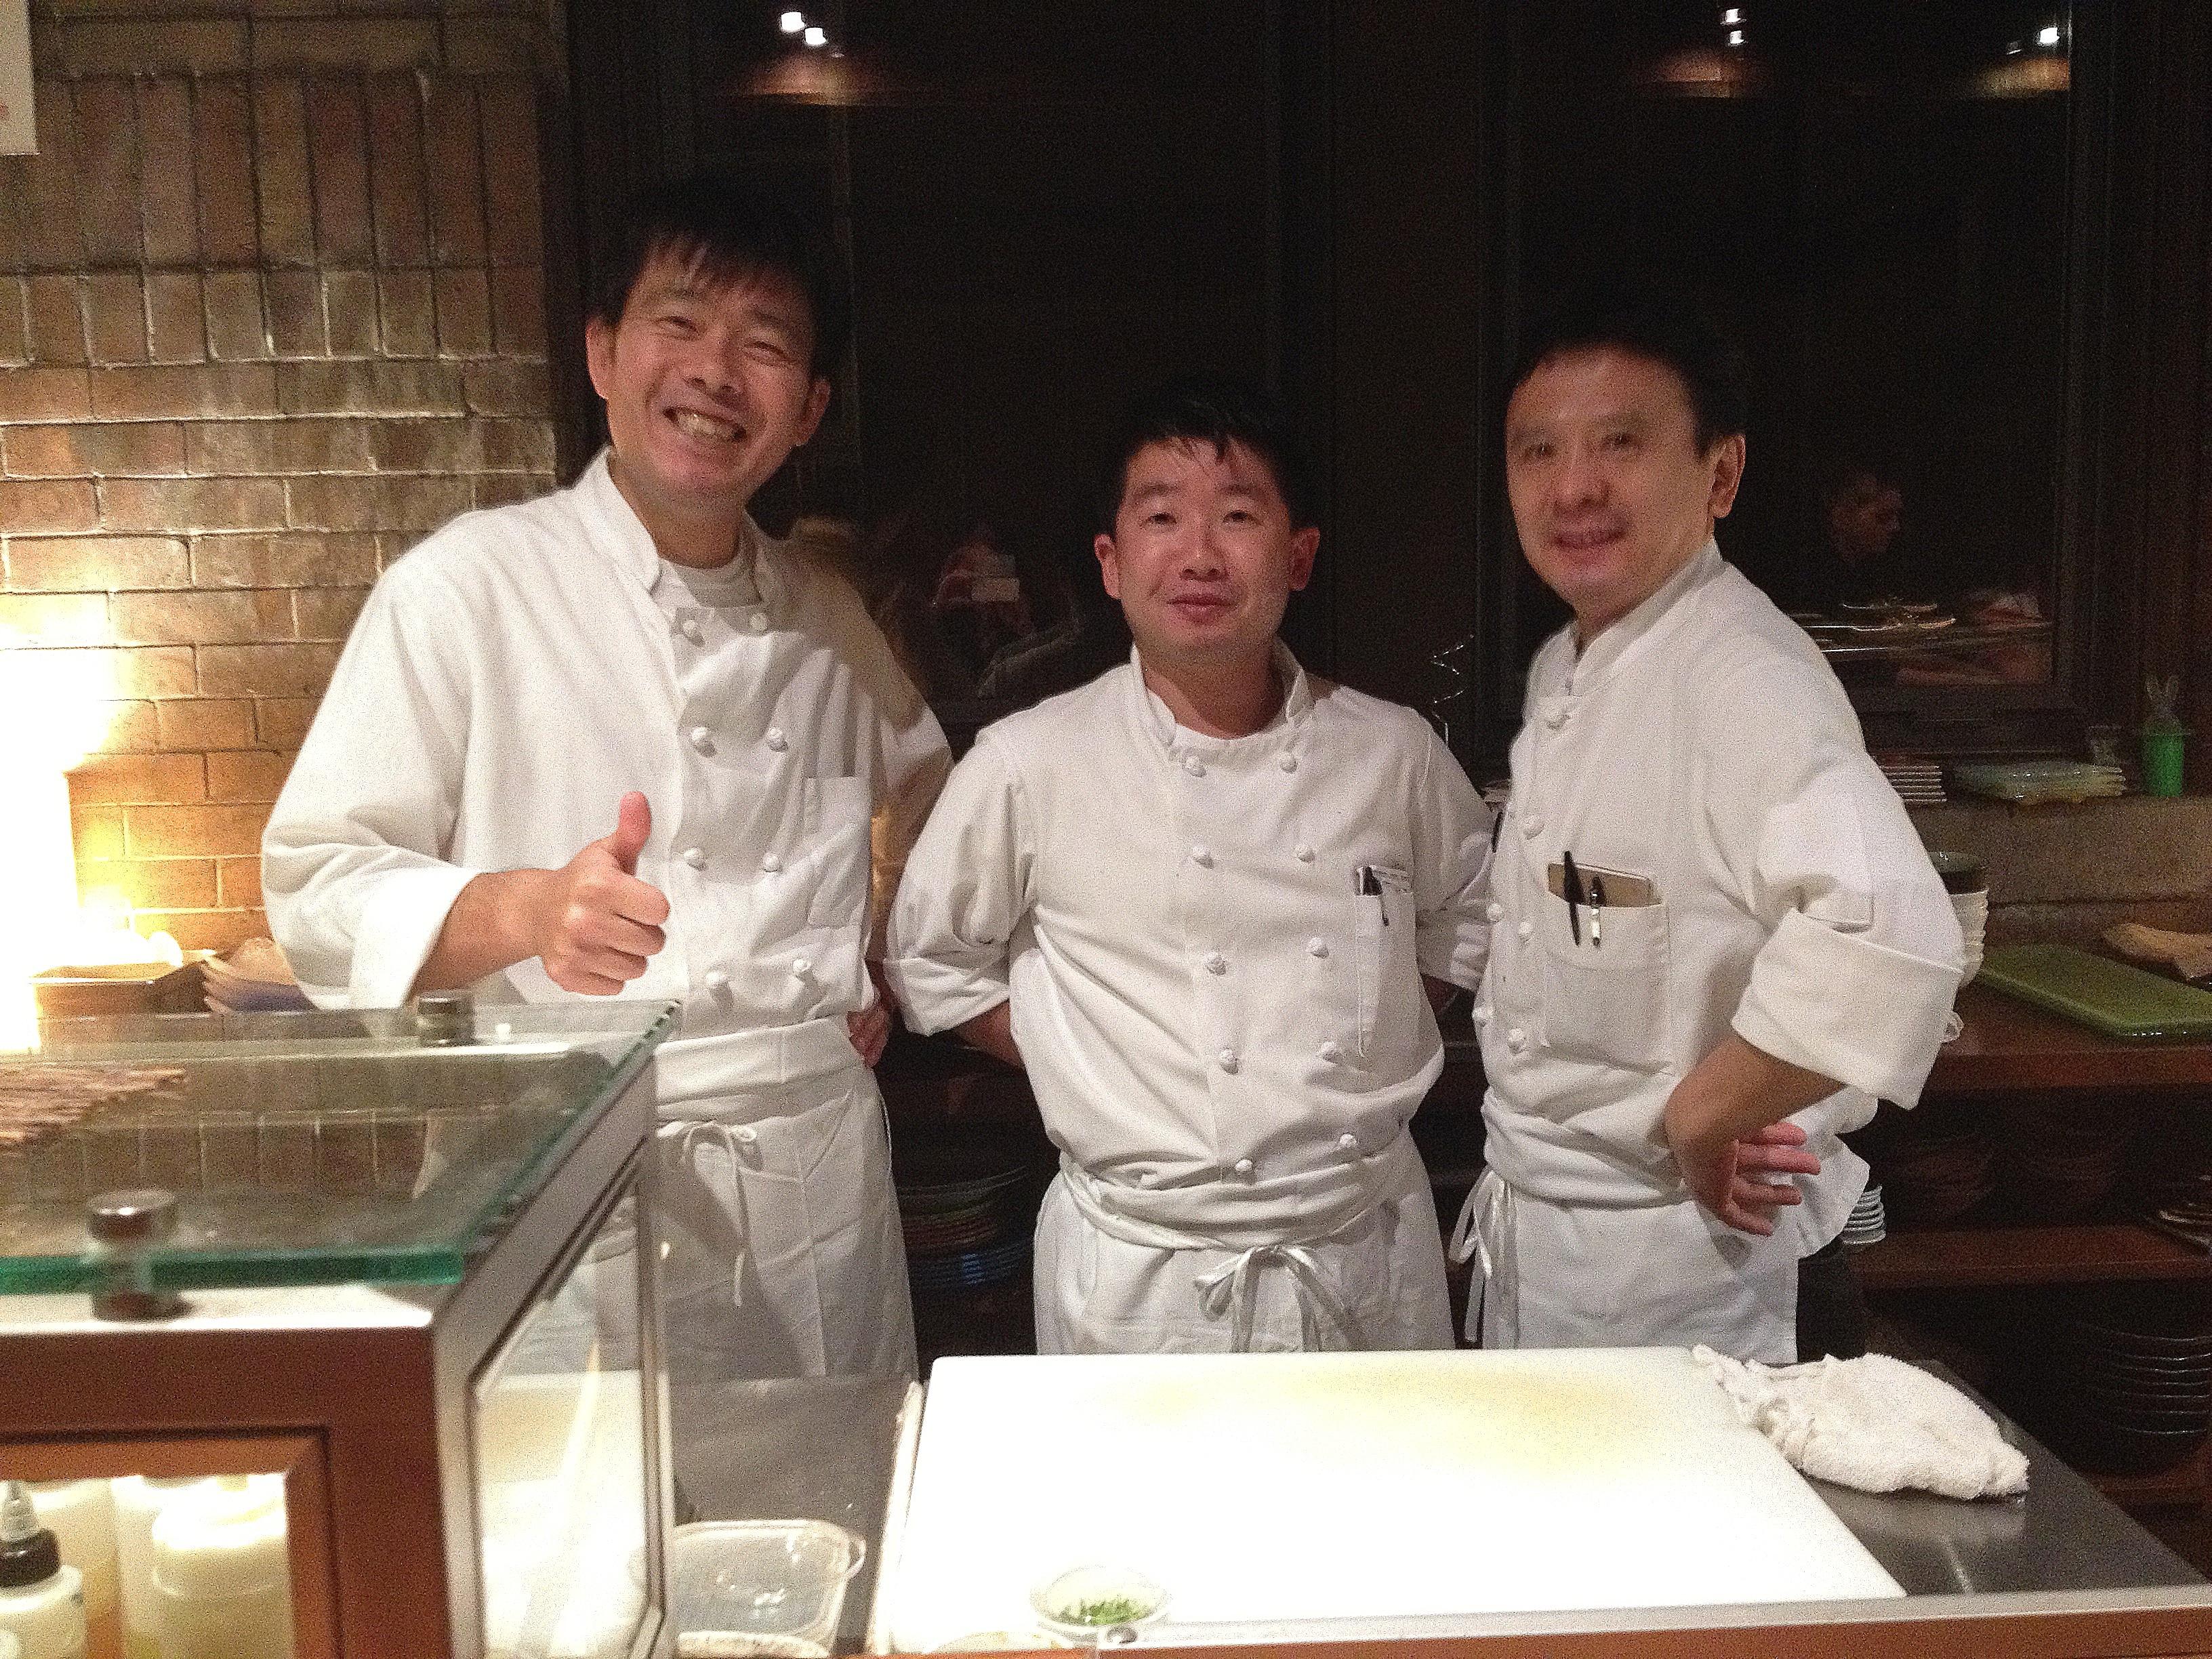 Three talented chefs!